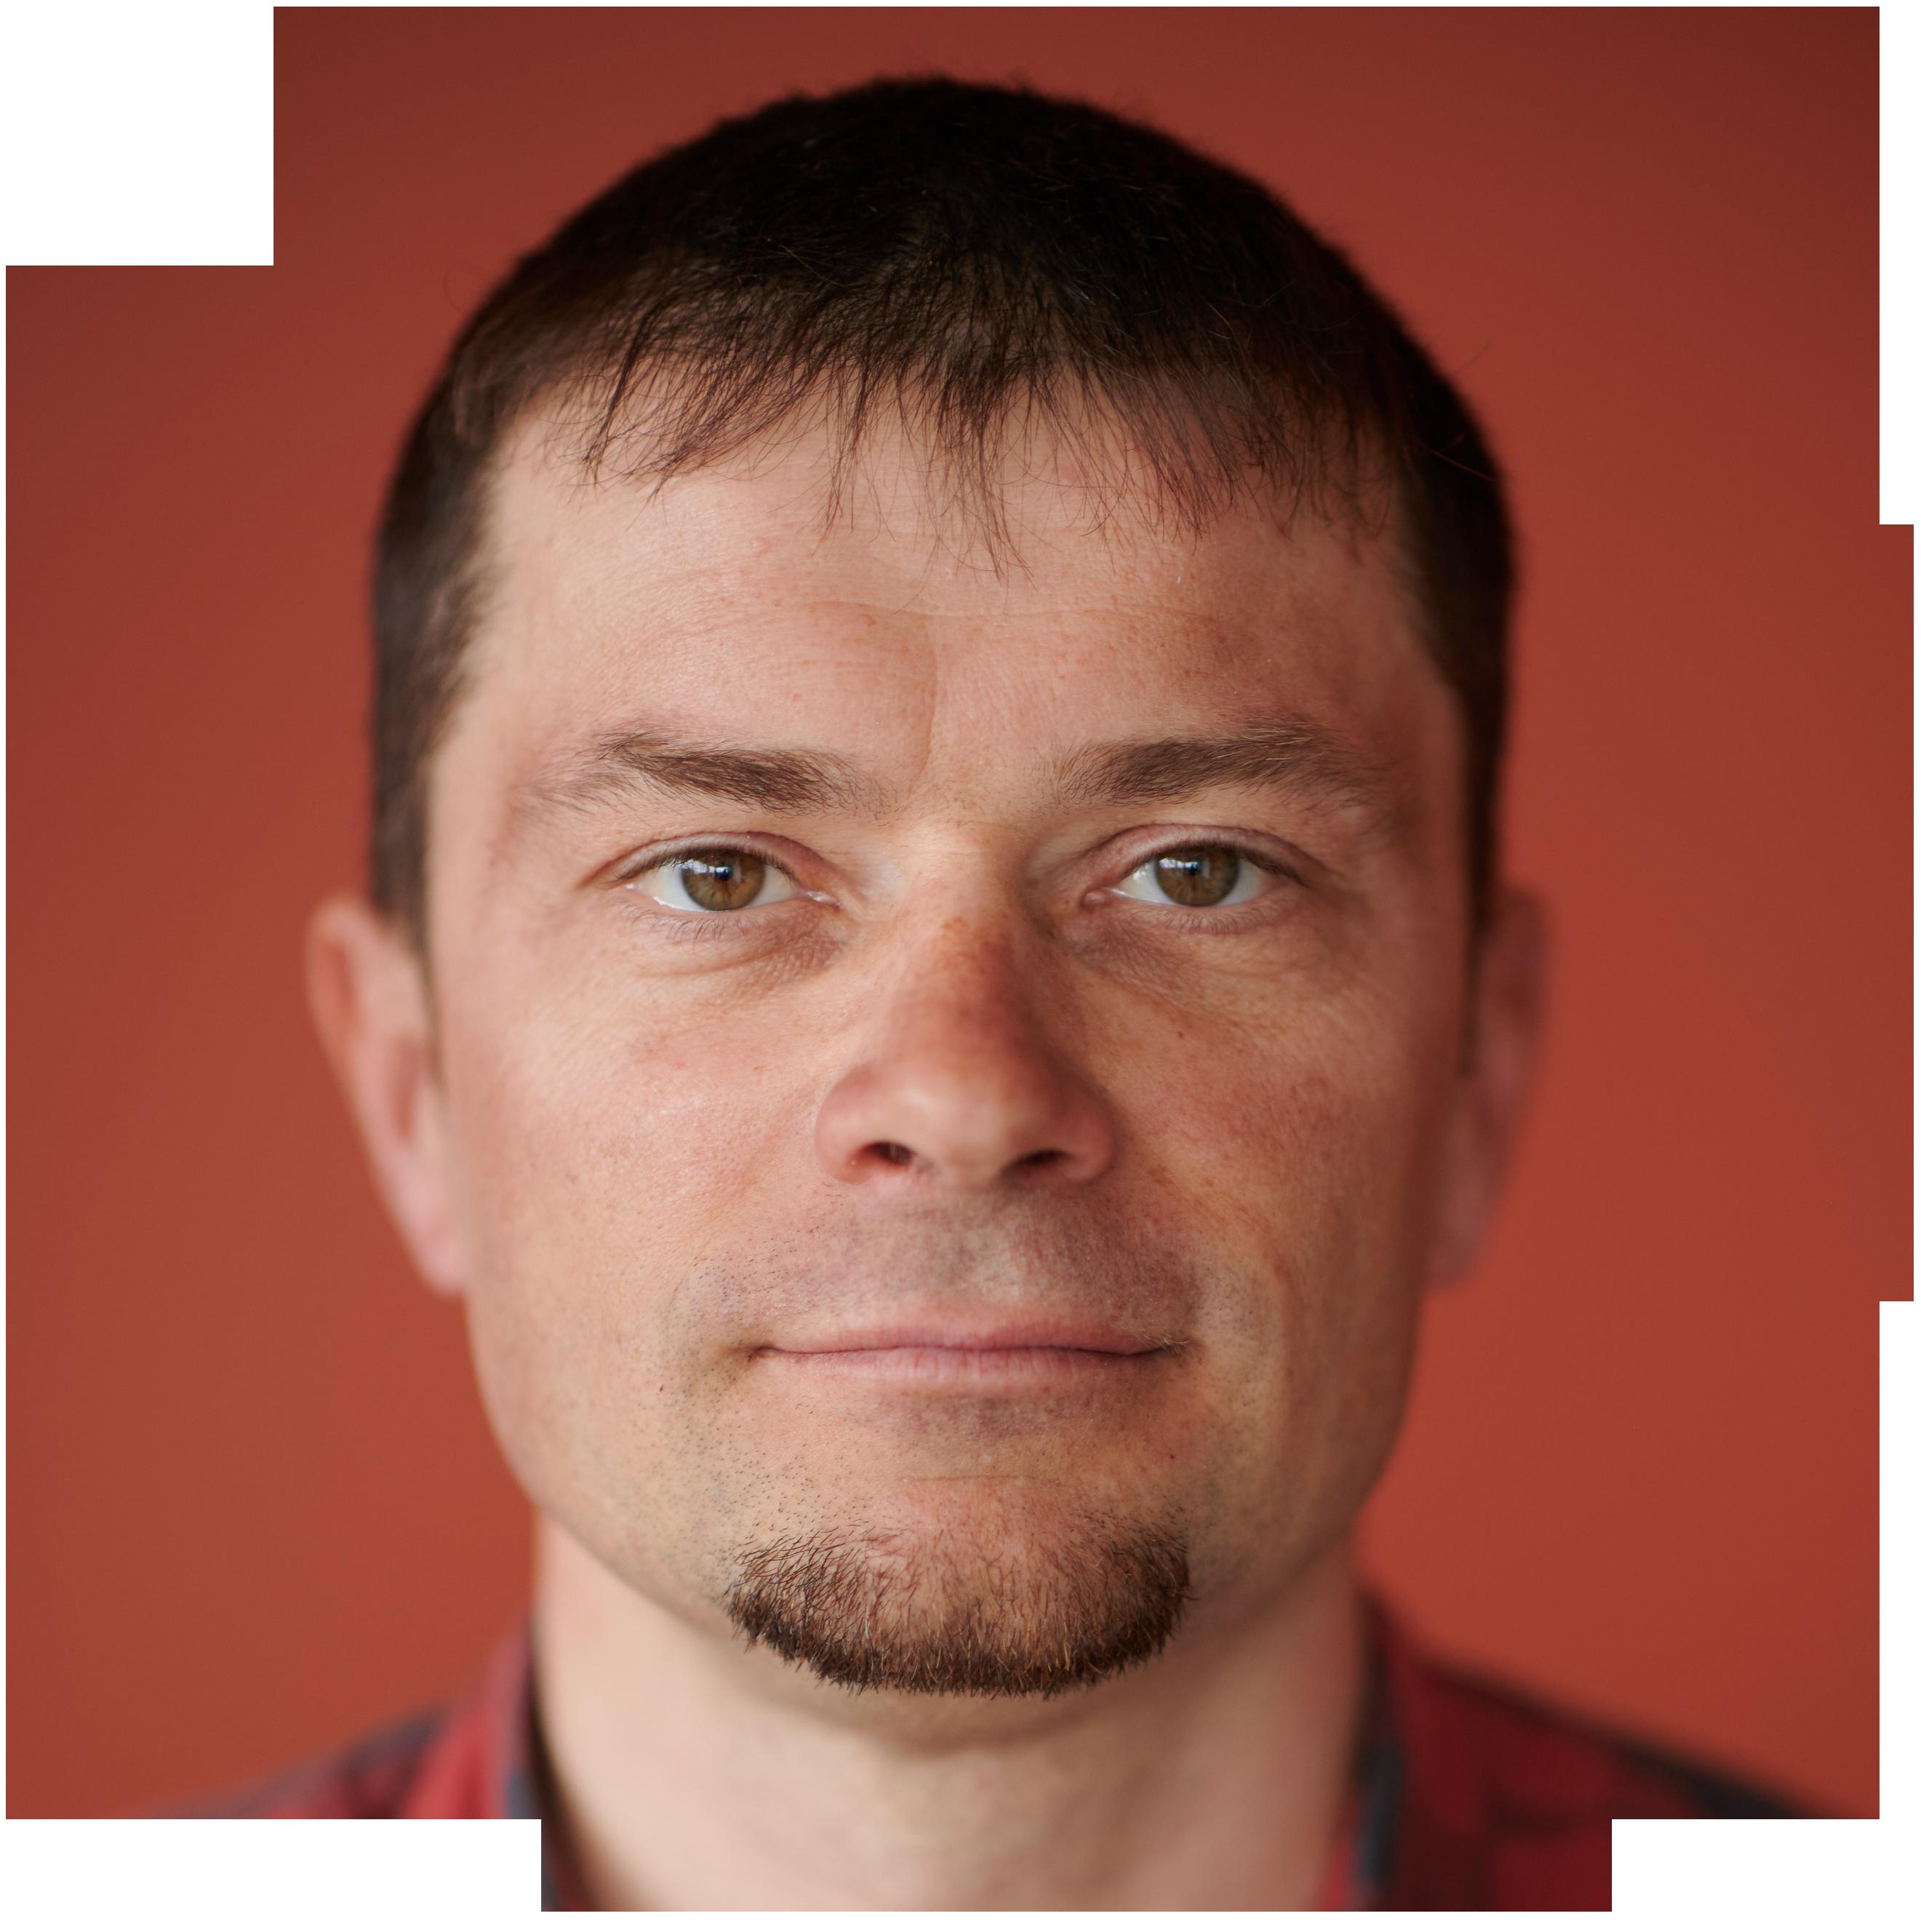 Александр Топорков, веб-разработчик Email Soldiers